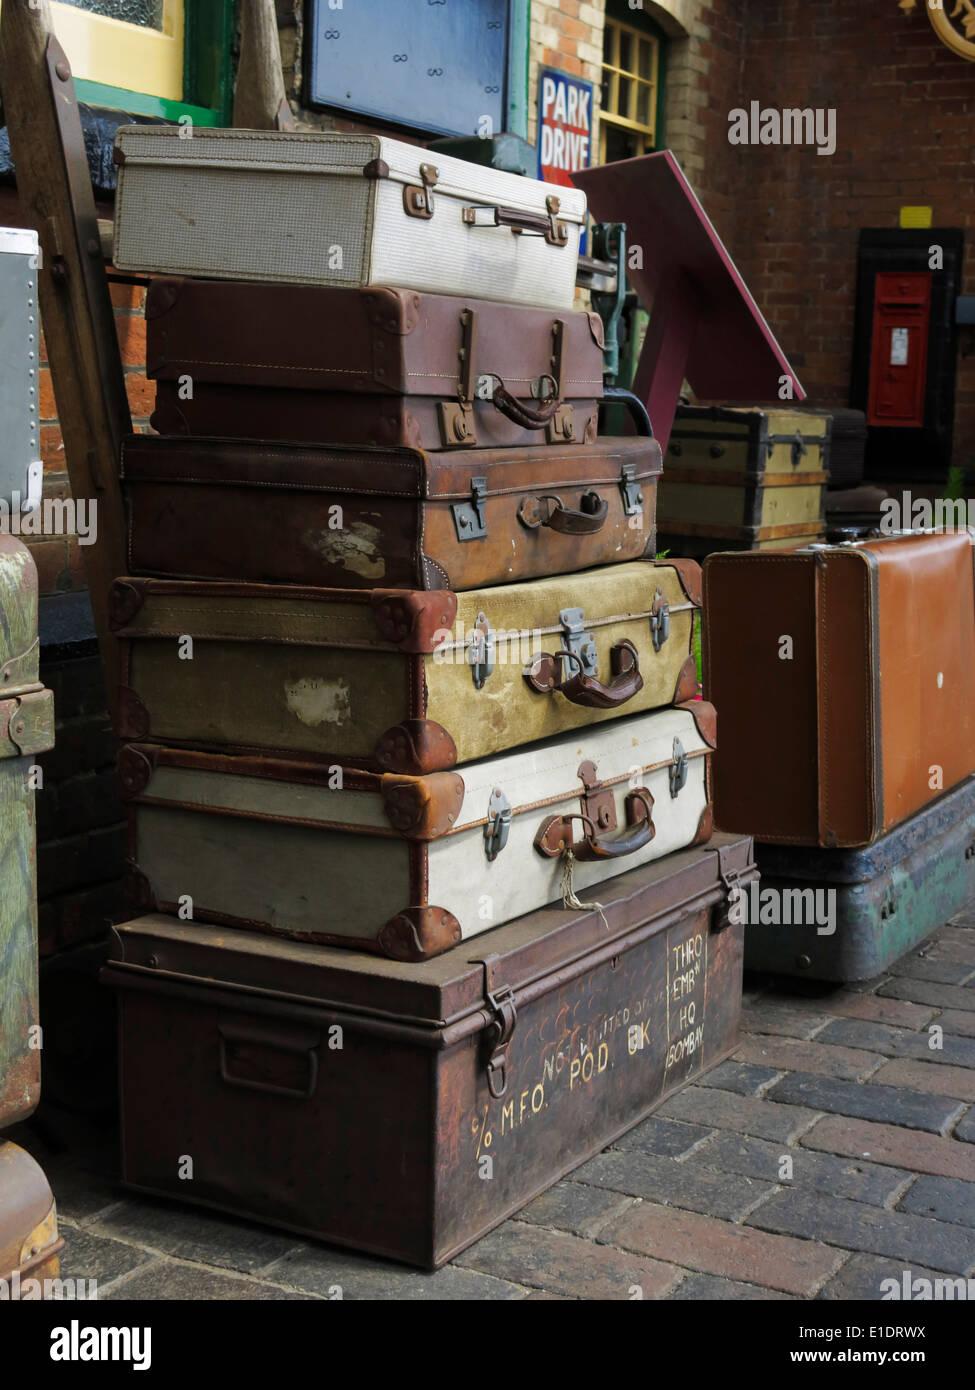 Luggage on yesteryear's, Sheringham railway station, North Norfolk, UK. - Stock Image